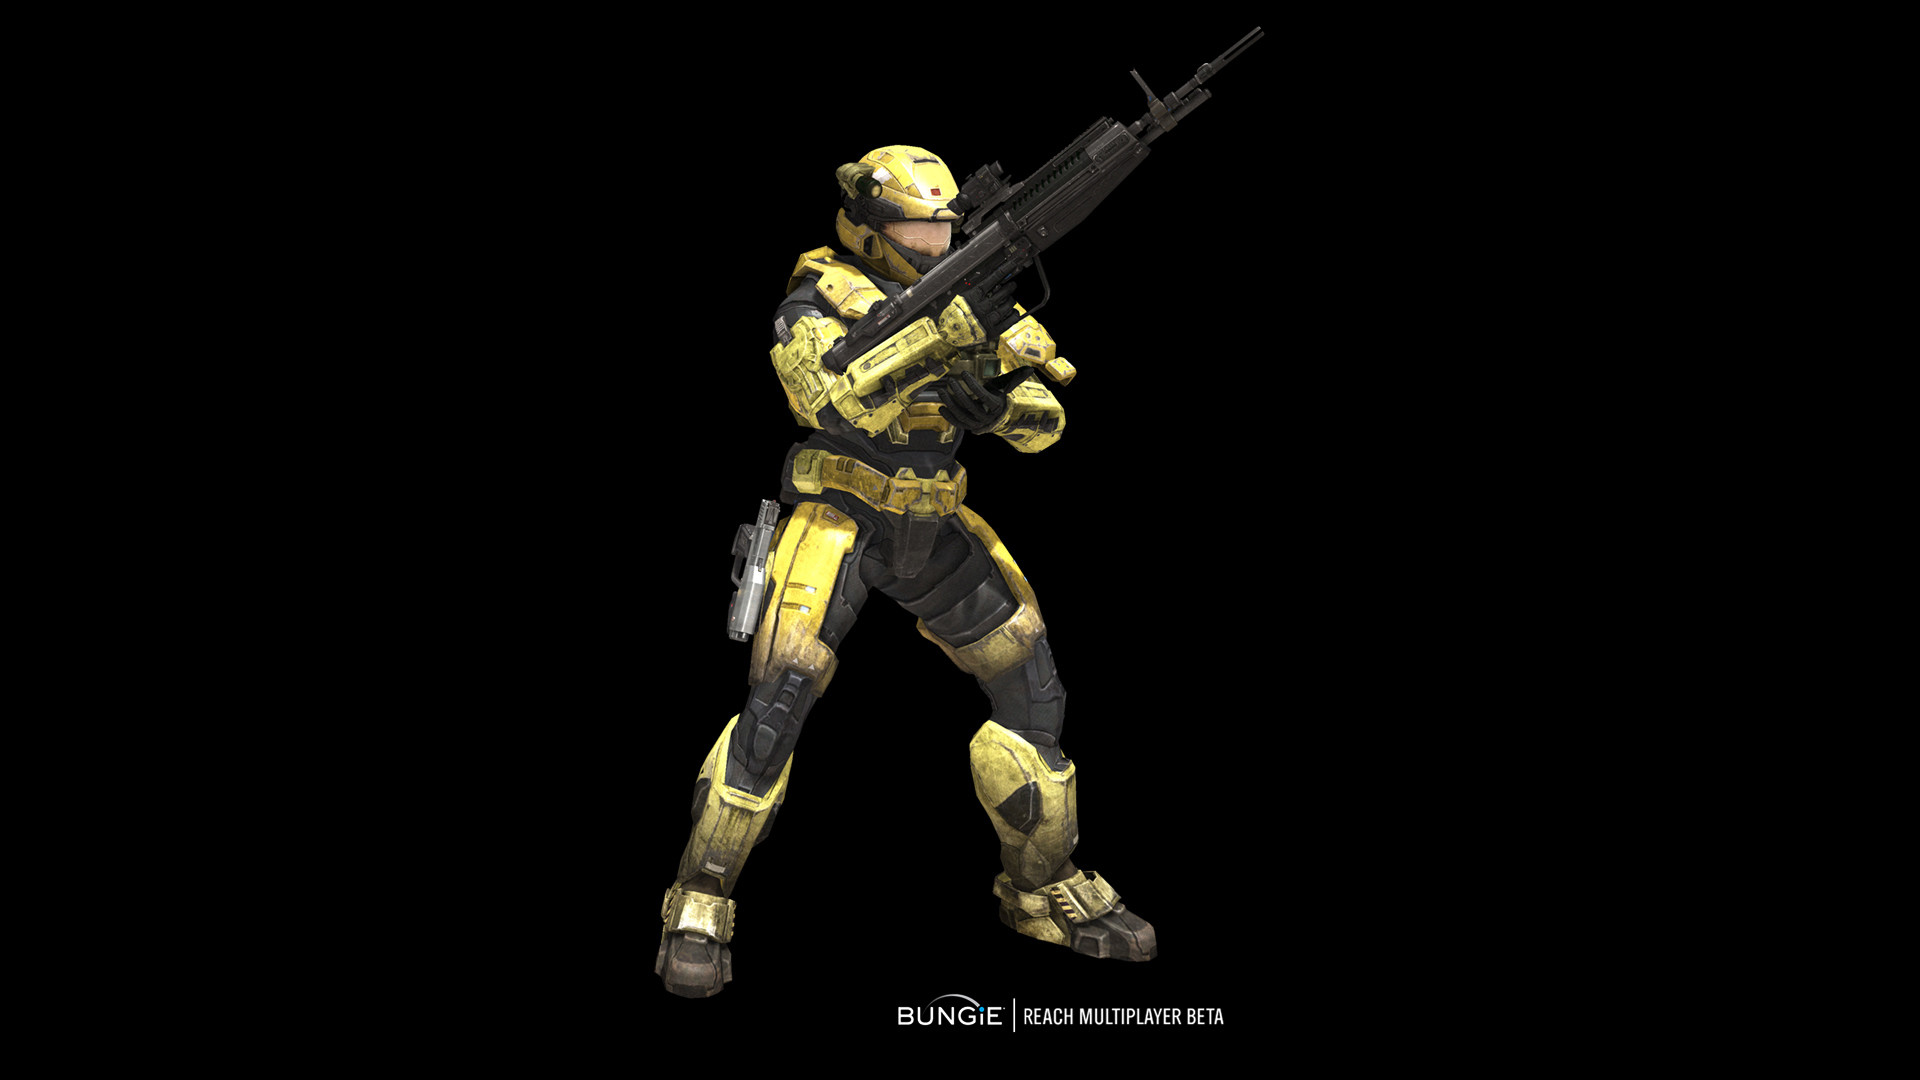 Attack On Titan Wallpaper Military Police